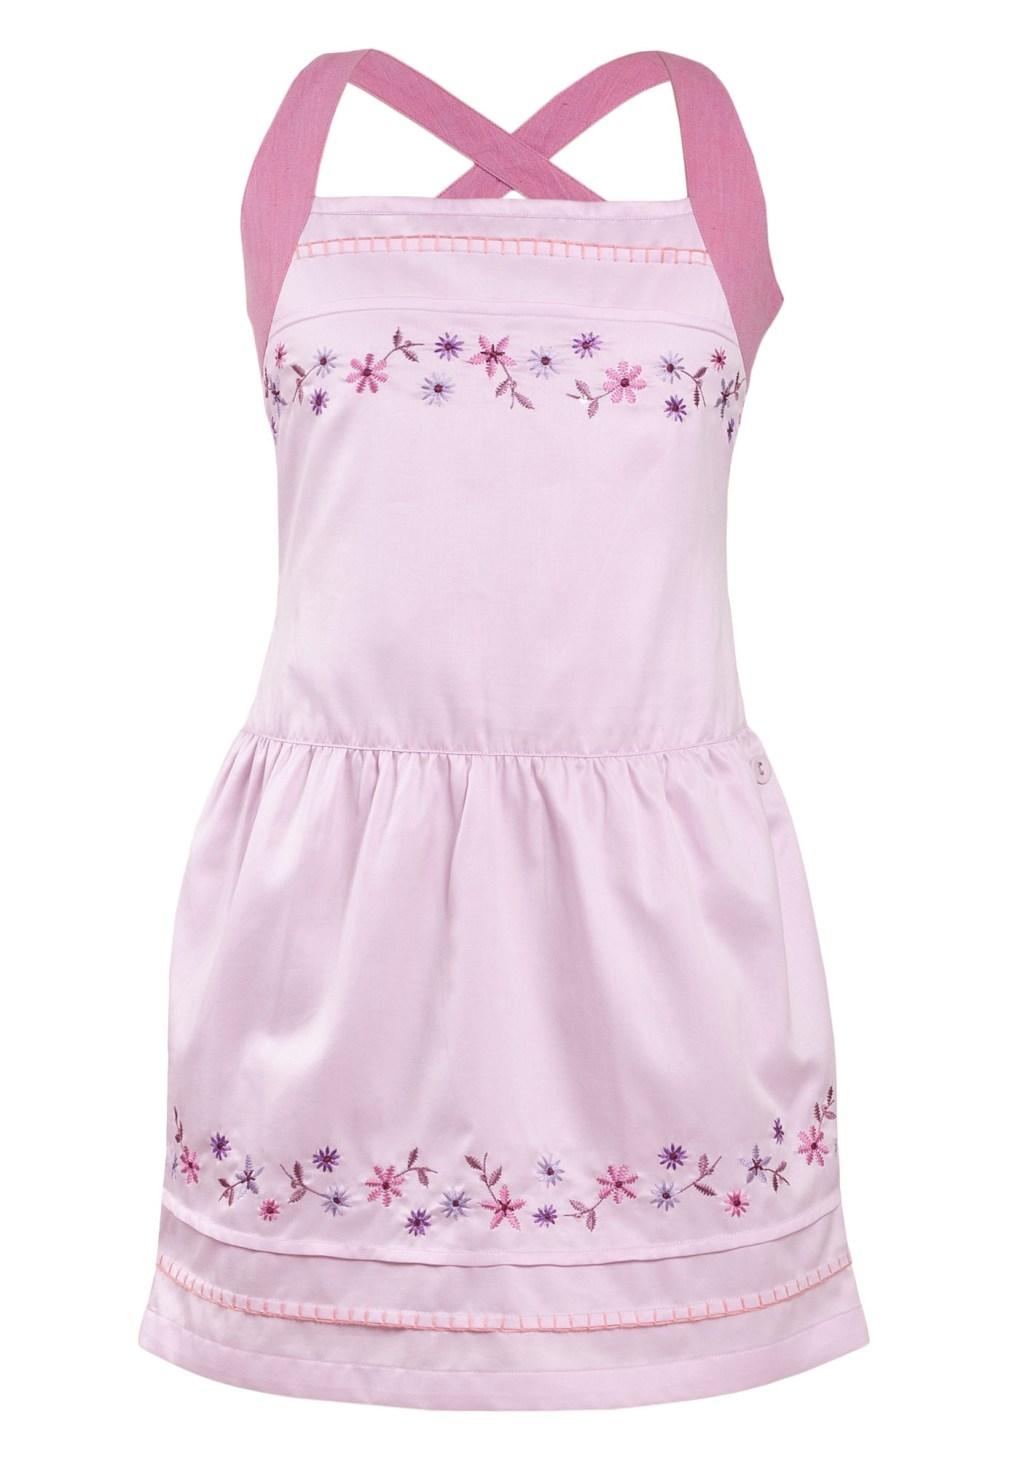 MINC Petite Princess Pink Girls Short Dress in Cotton Satin